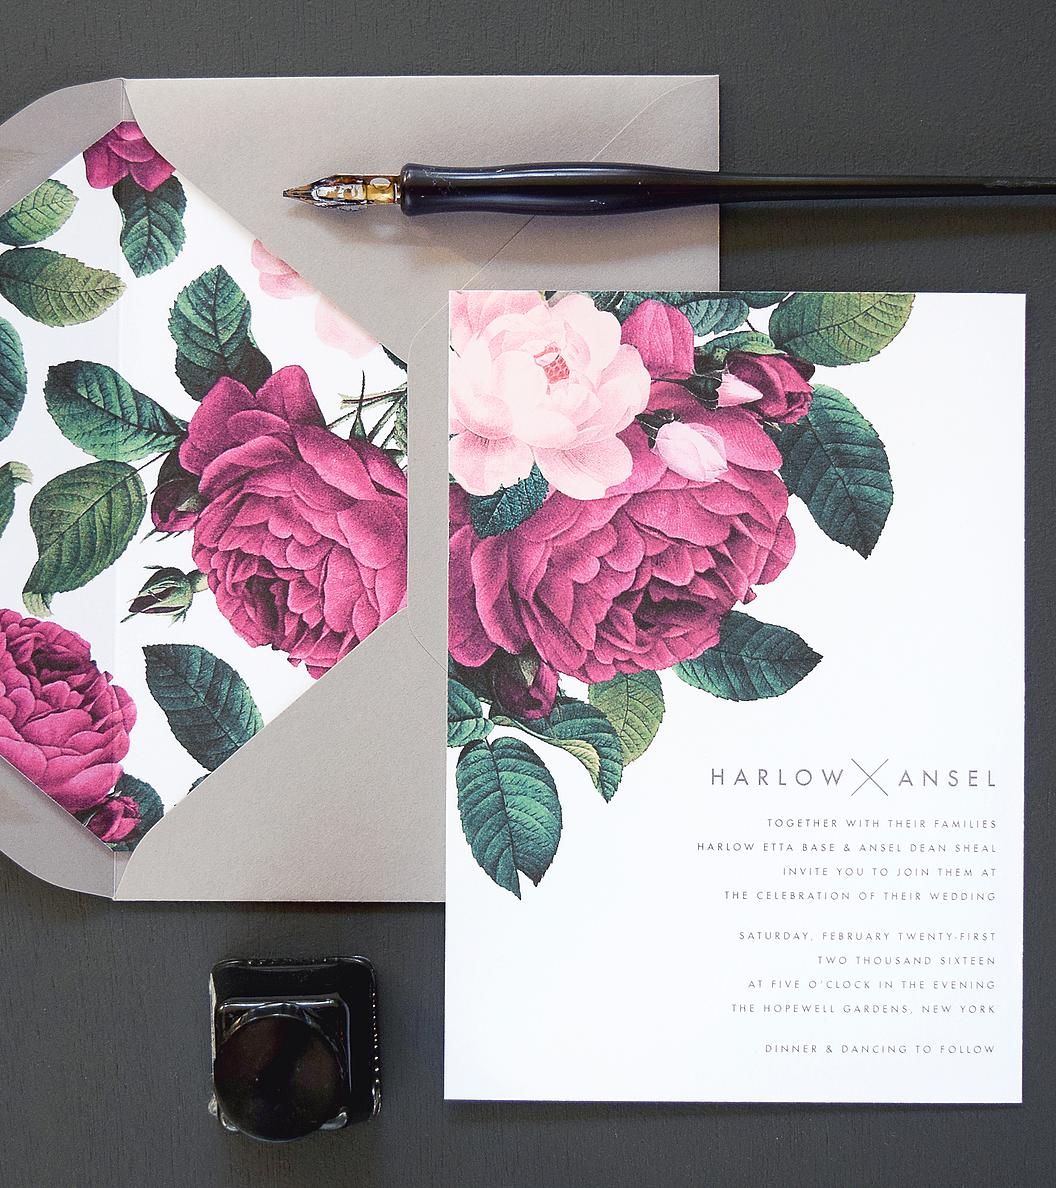 wedding invite background design%0A Floral Wedding Invitations by Rachel Marvin Creative